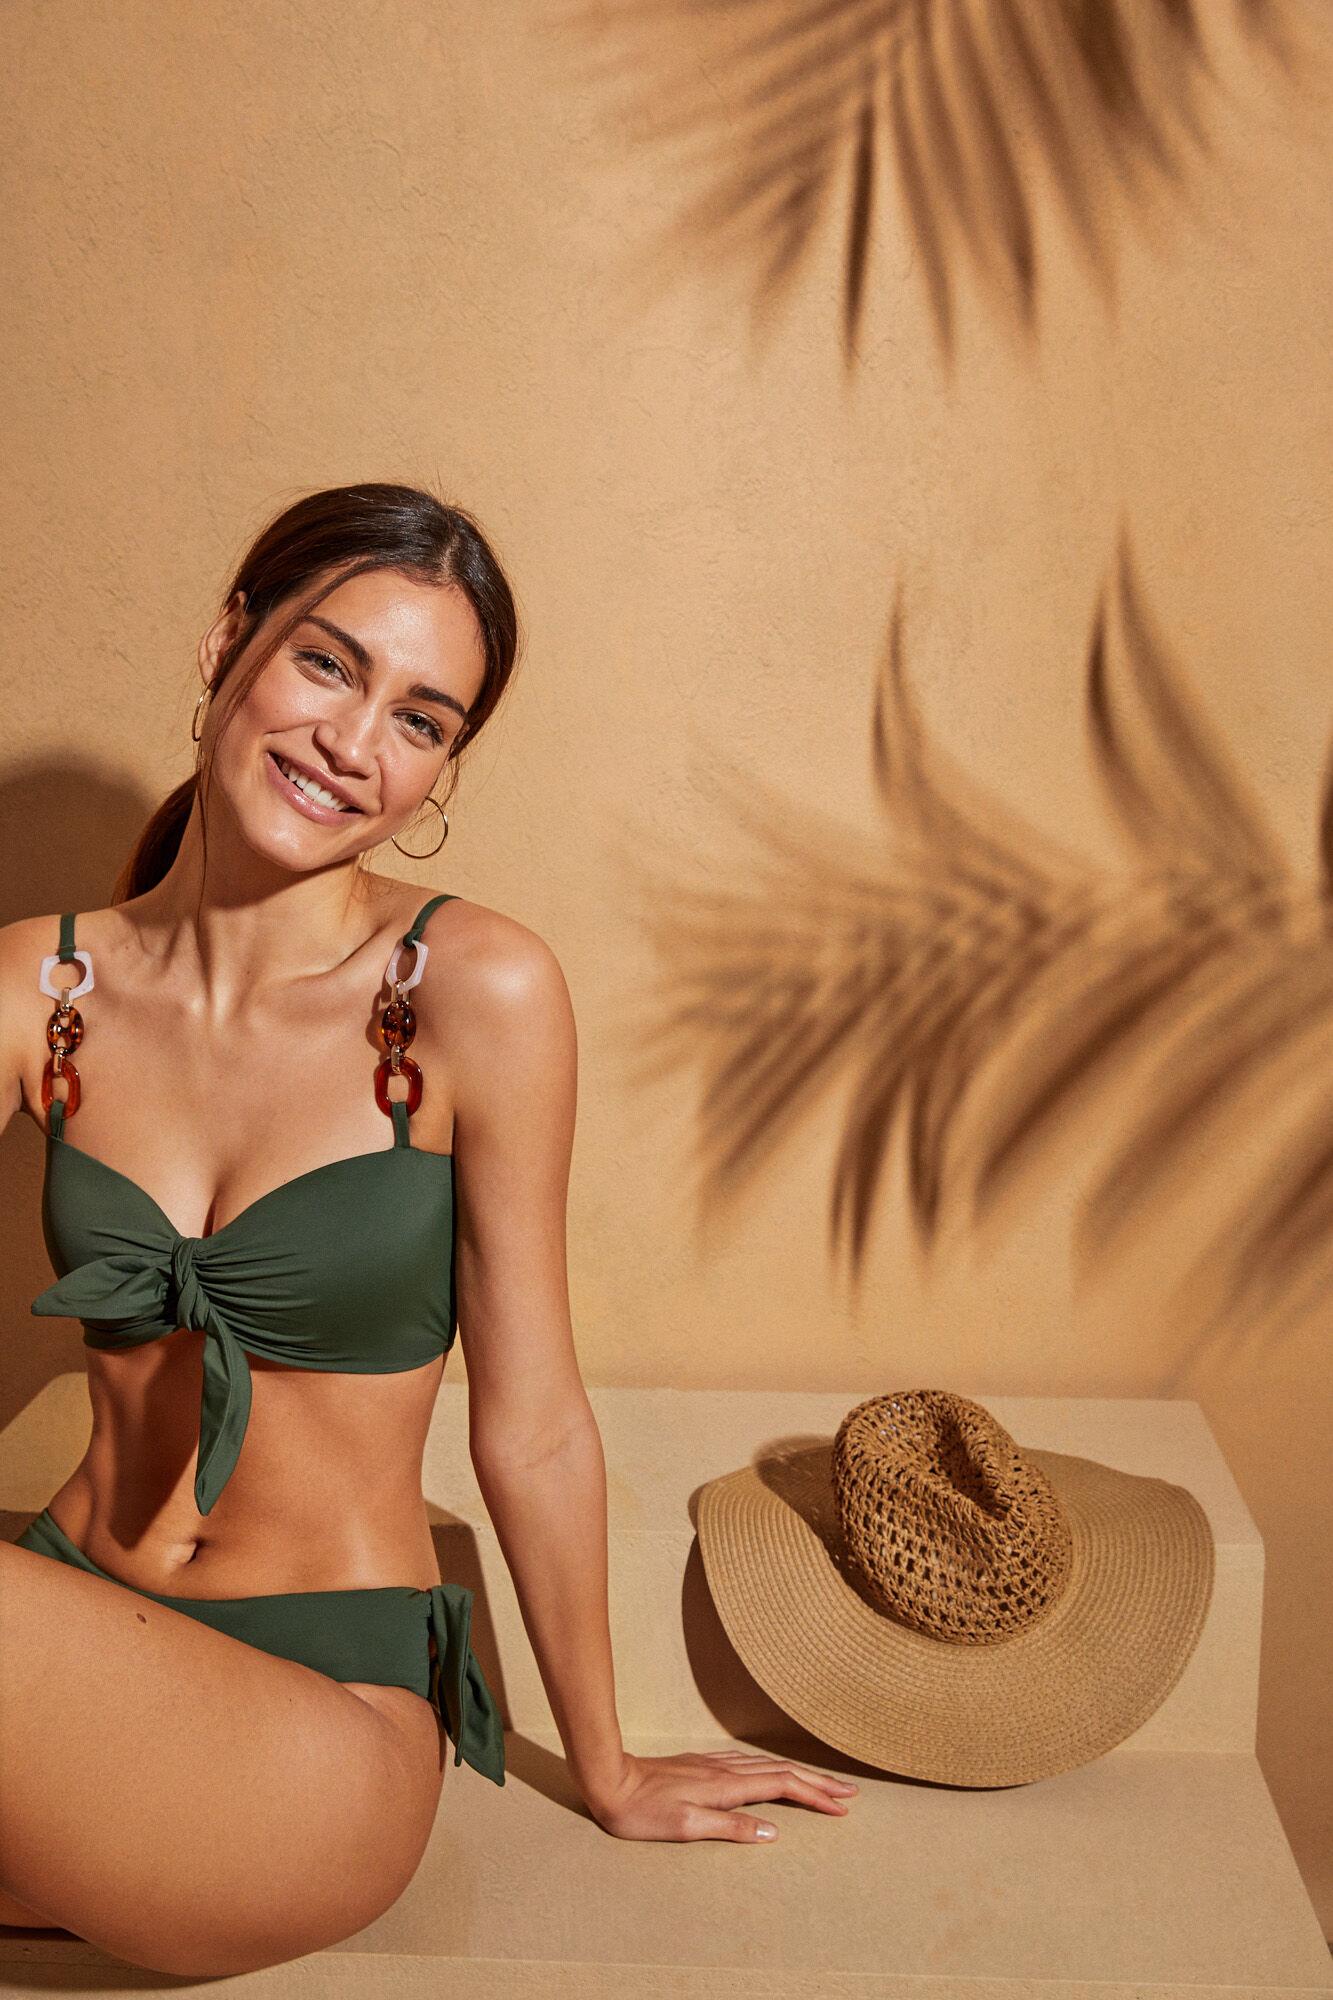 Bikini con top bralette verde con tirantes cadena marrones